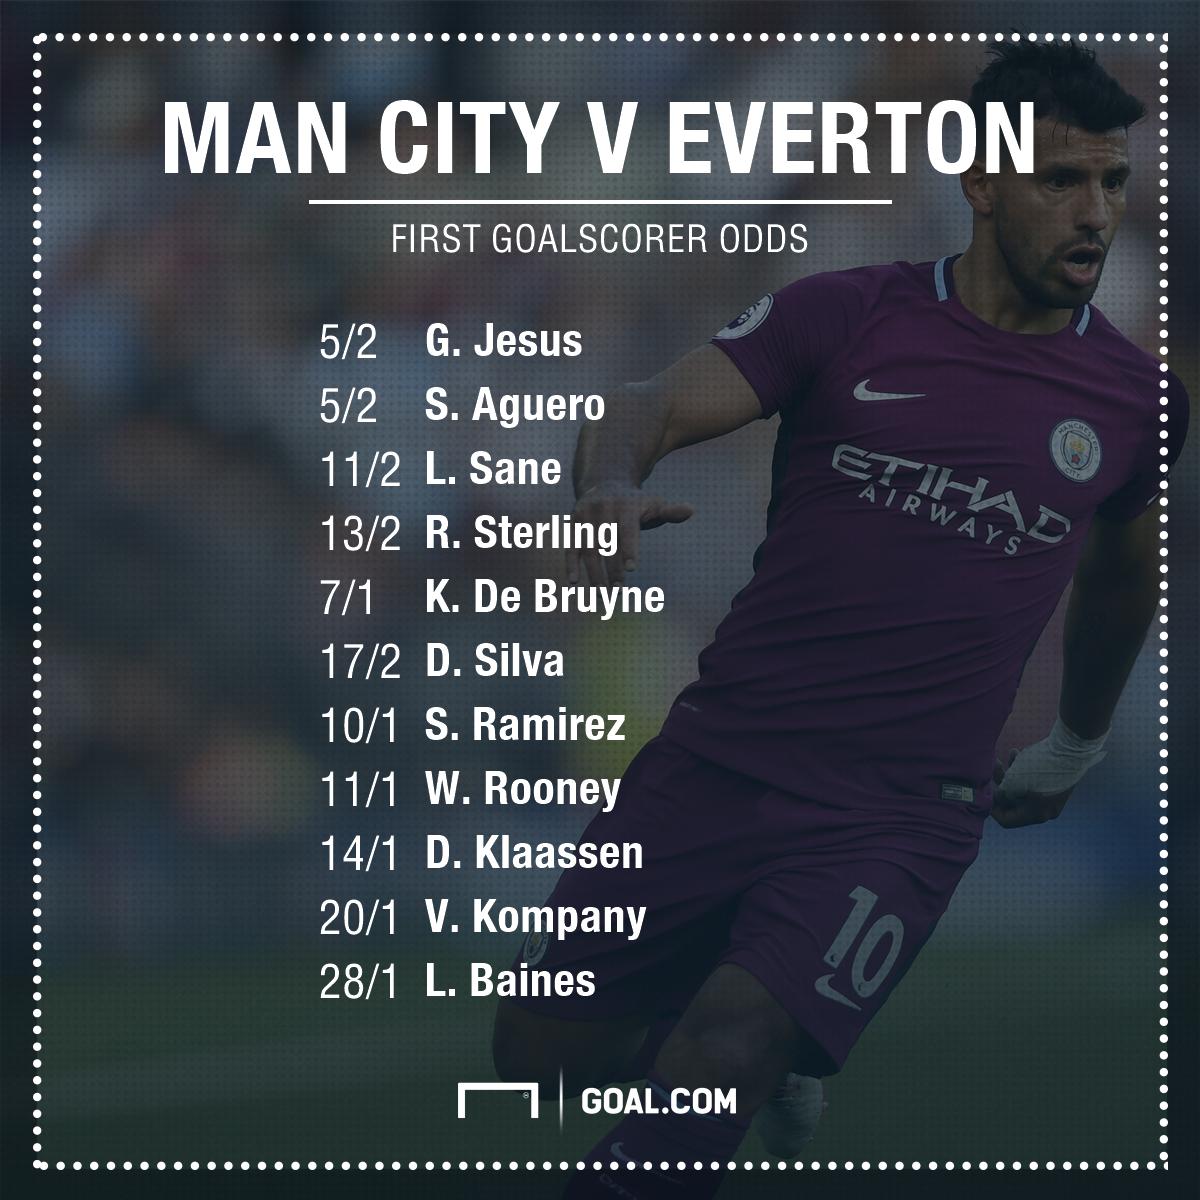 Man City v Everton betting